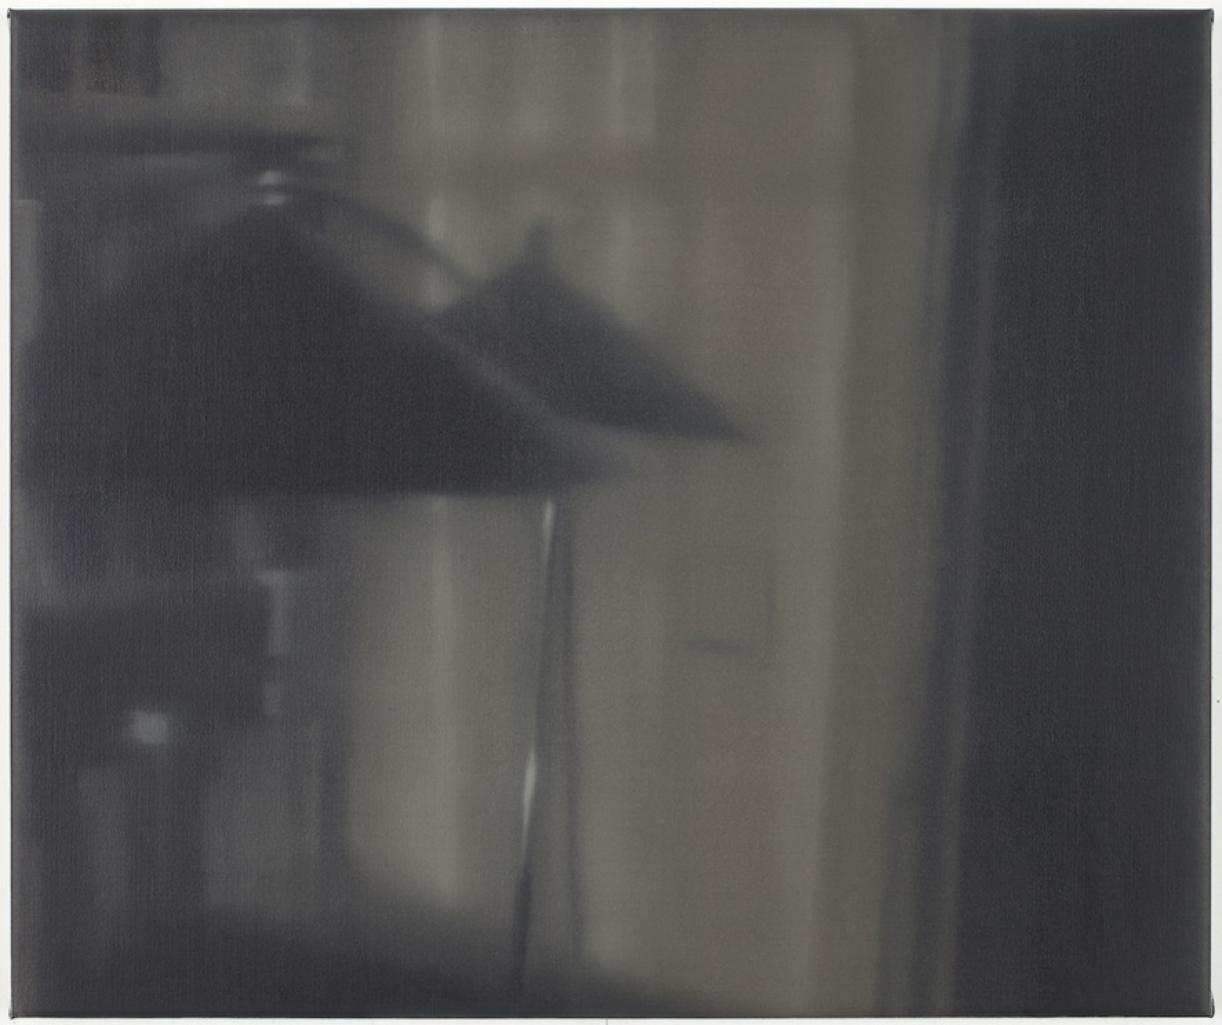 Bert de Beul, Untitled, 2010, Oil on canvas, 62,5 x 74,5 cm